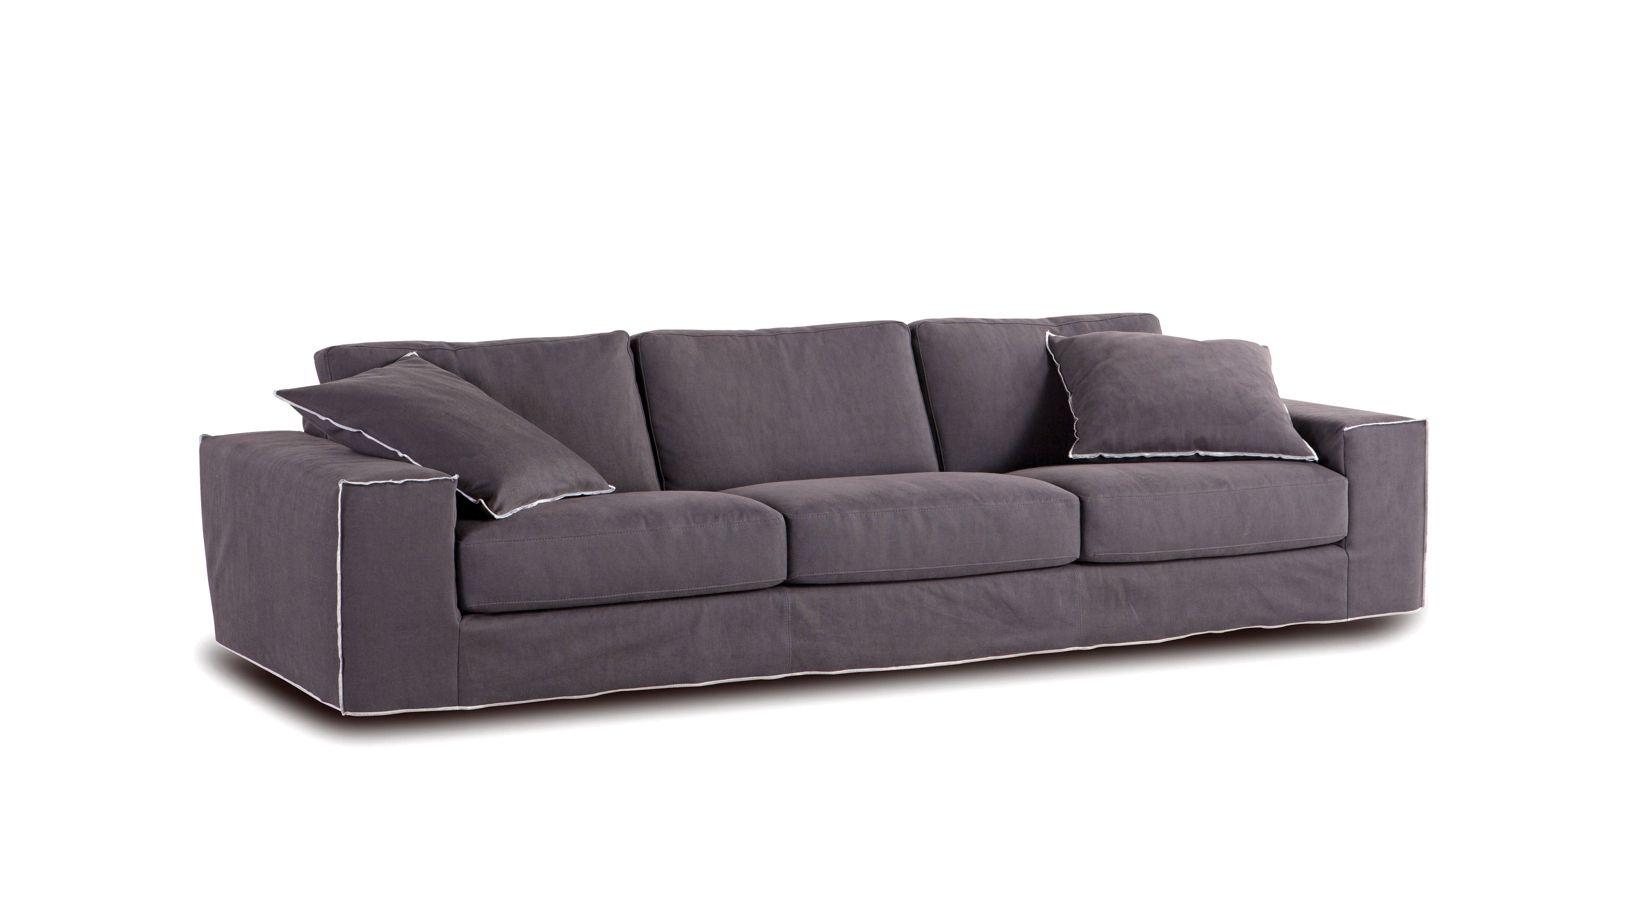 ardara 4 seat sofa roche bobois. Black Bedroom Furniture Sets. Home Design Ideas